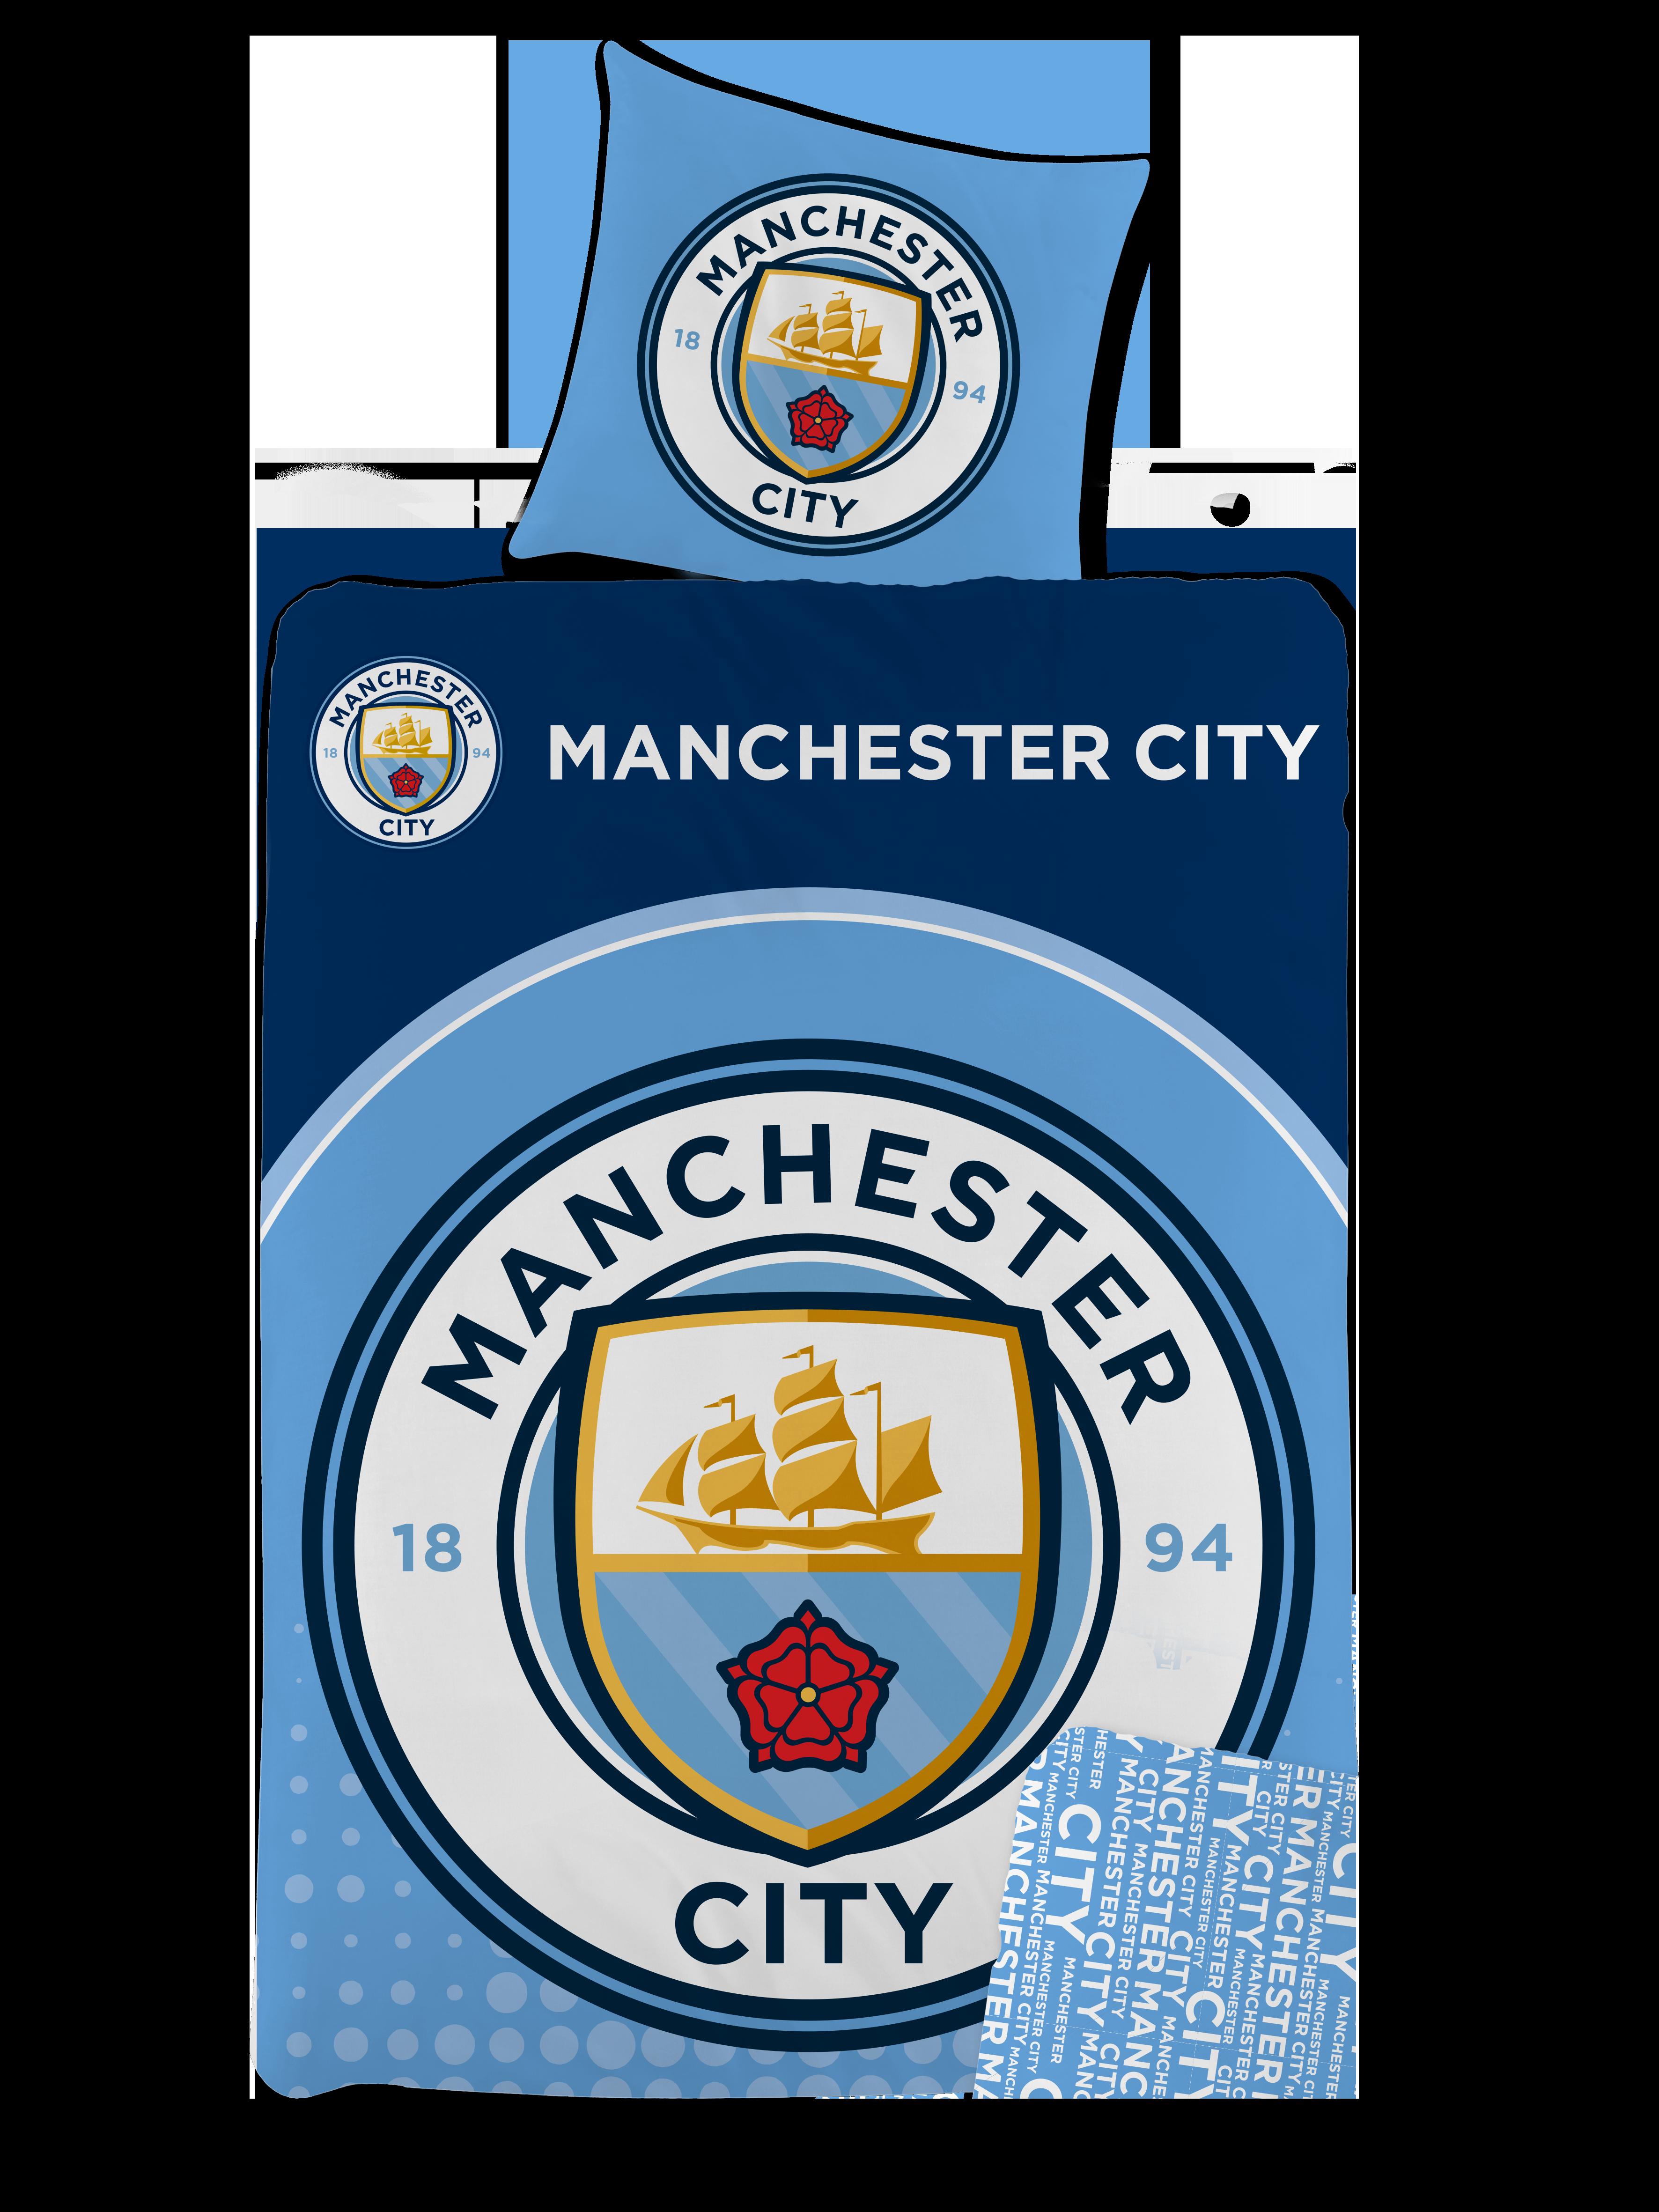 Bed Linen - Adult Size 140 x 200 cm -  Manchester City (1000273)